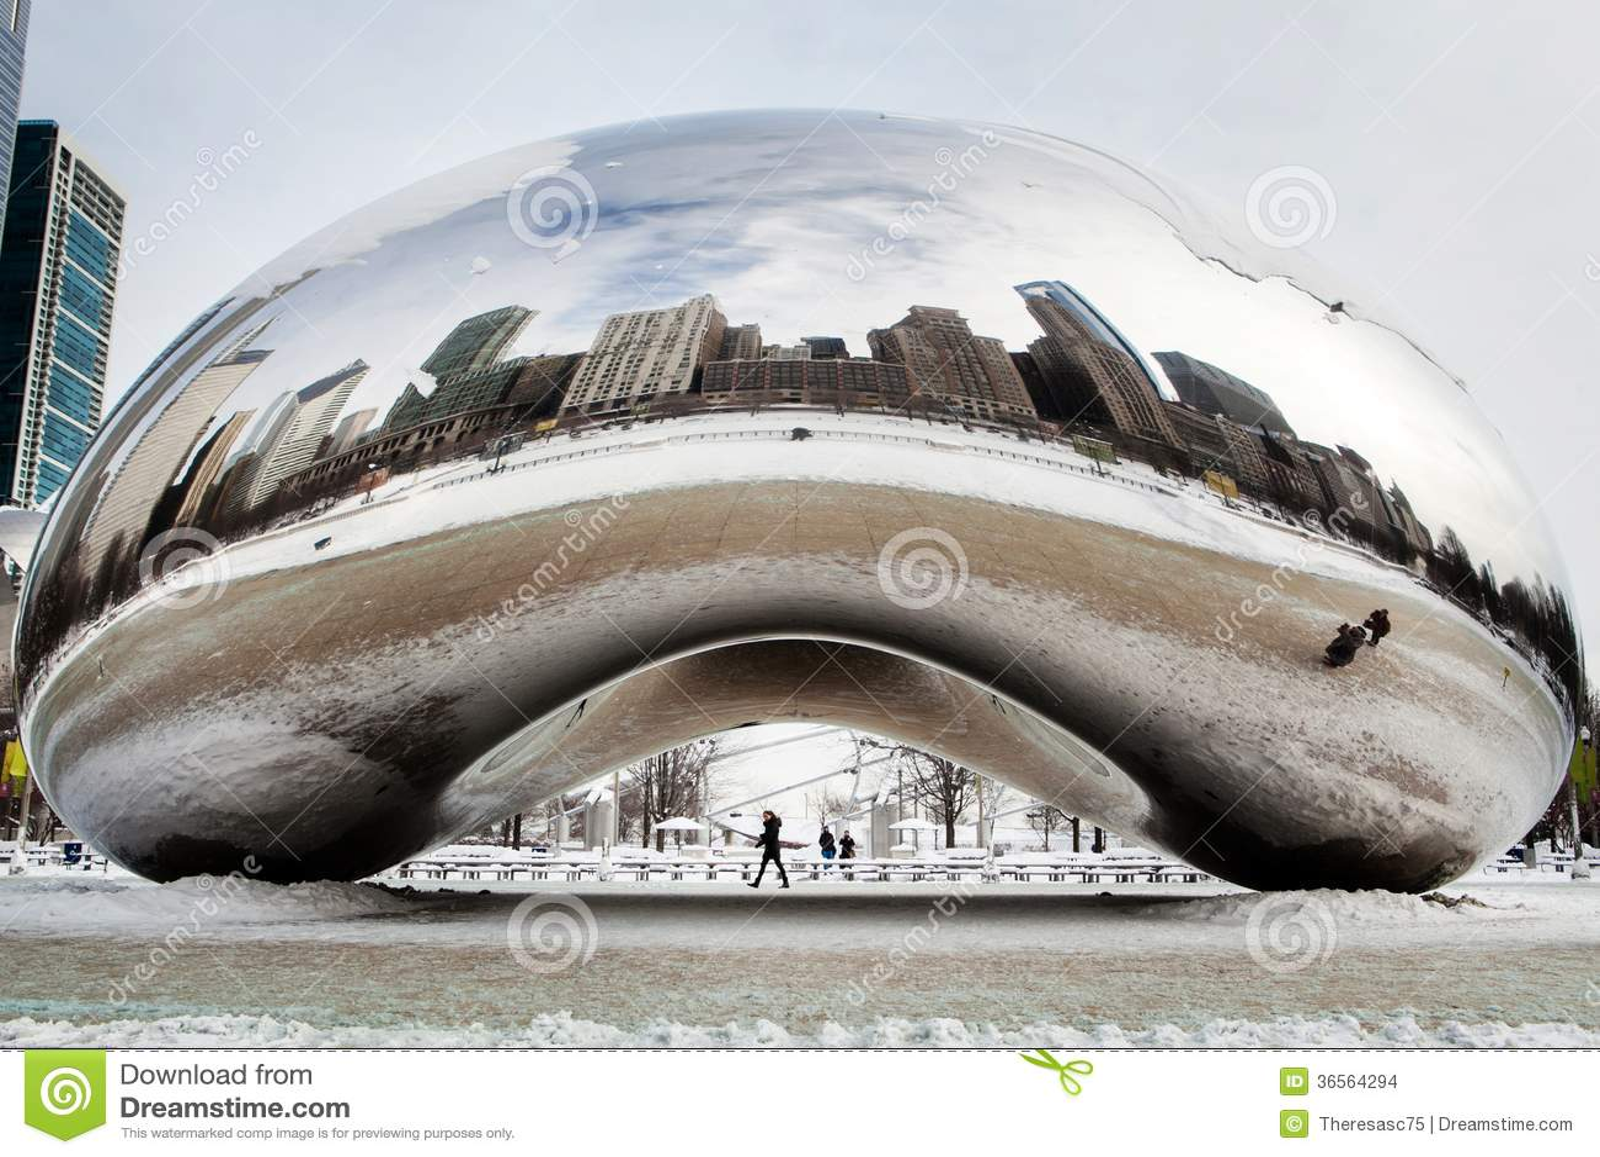 Cloud Gate Winter Editorial Stock Image - Image: 36564294